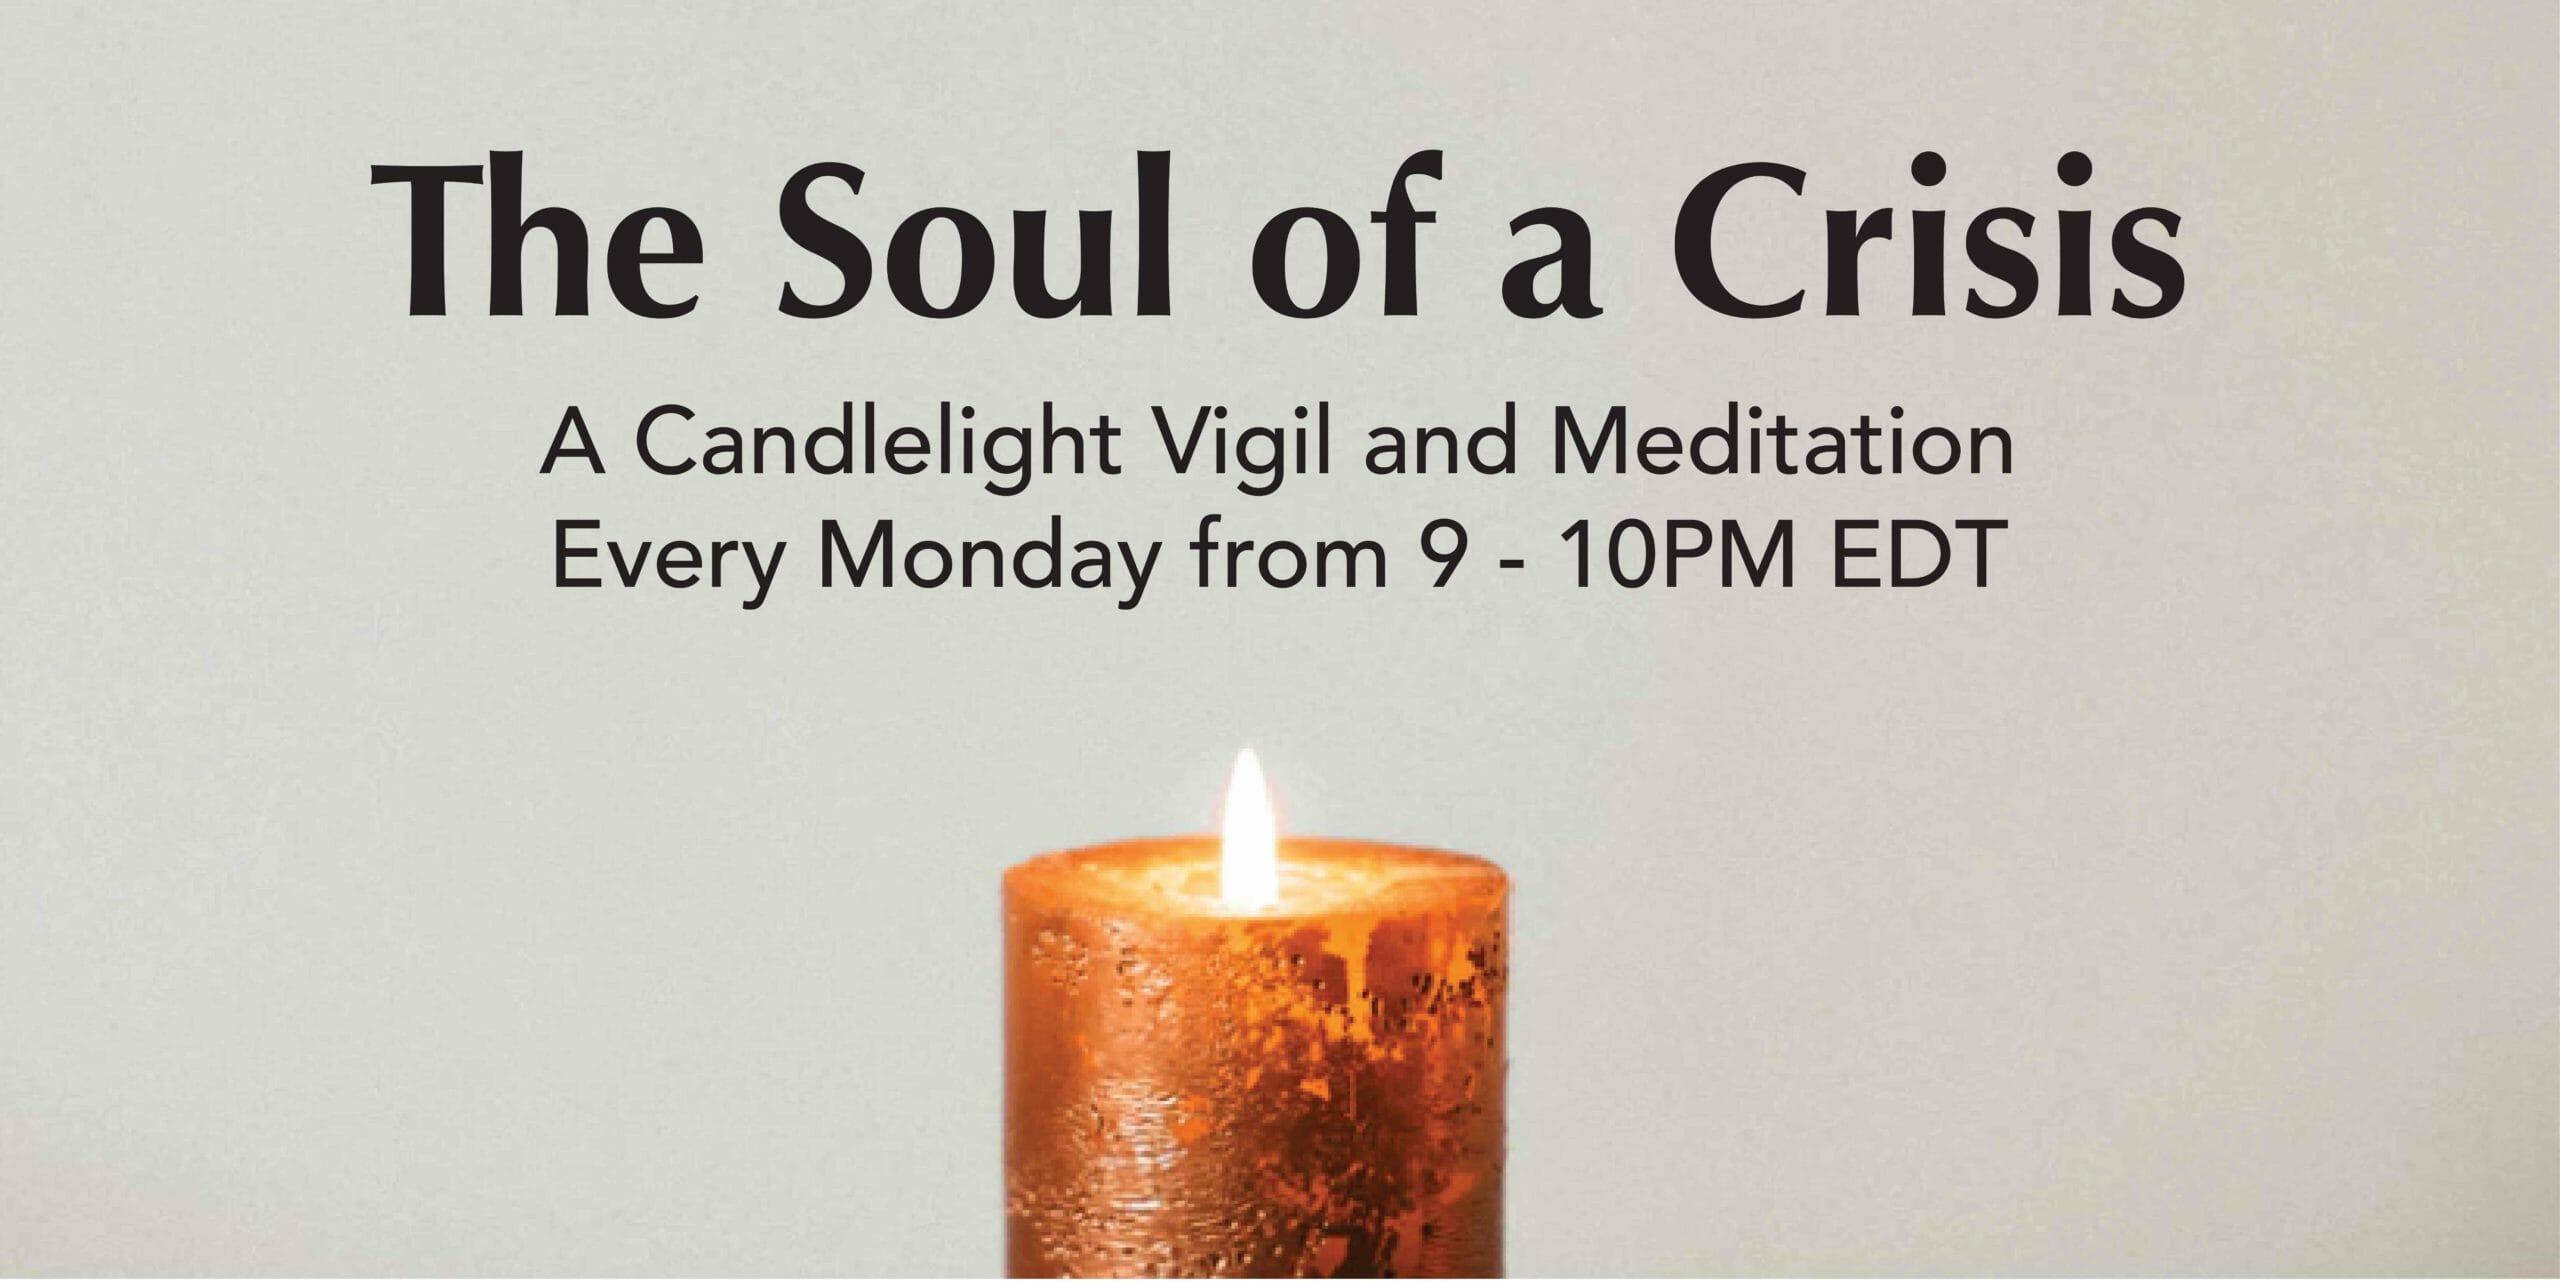 Soul of a Crisis - Promo Image - small